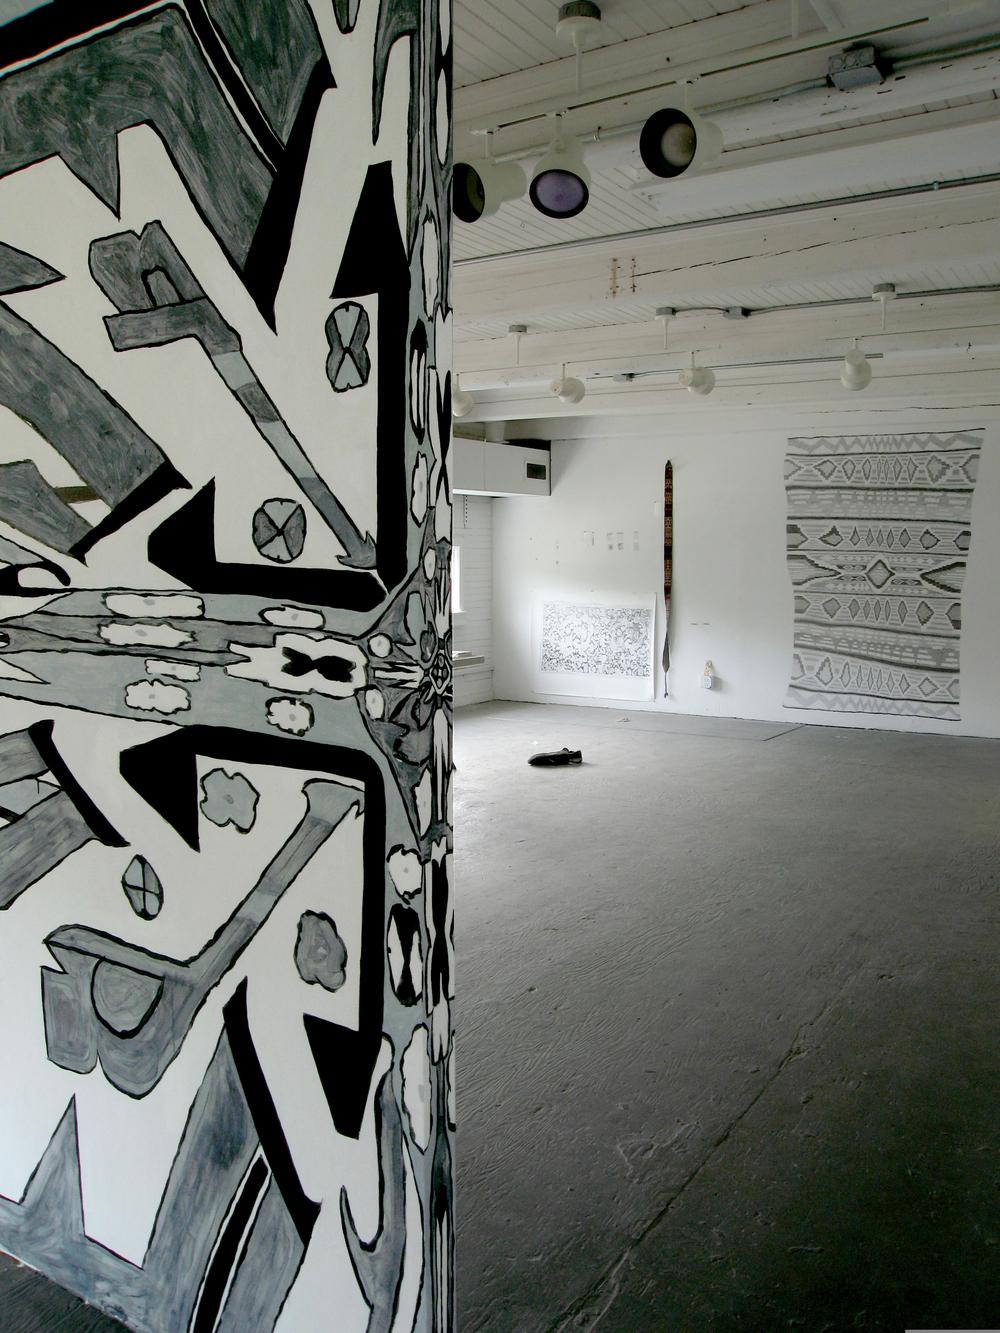 09 islip wall 04.jpg